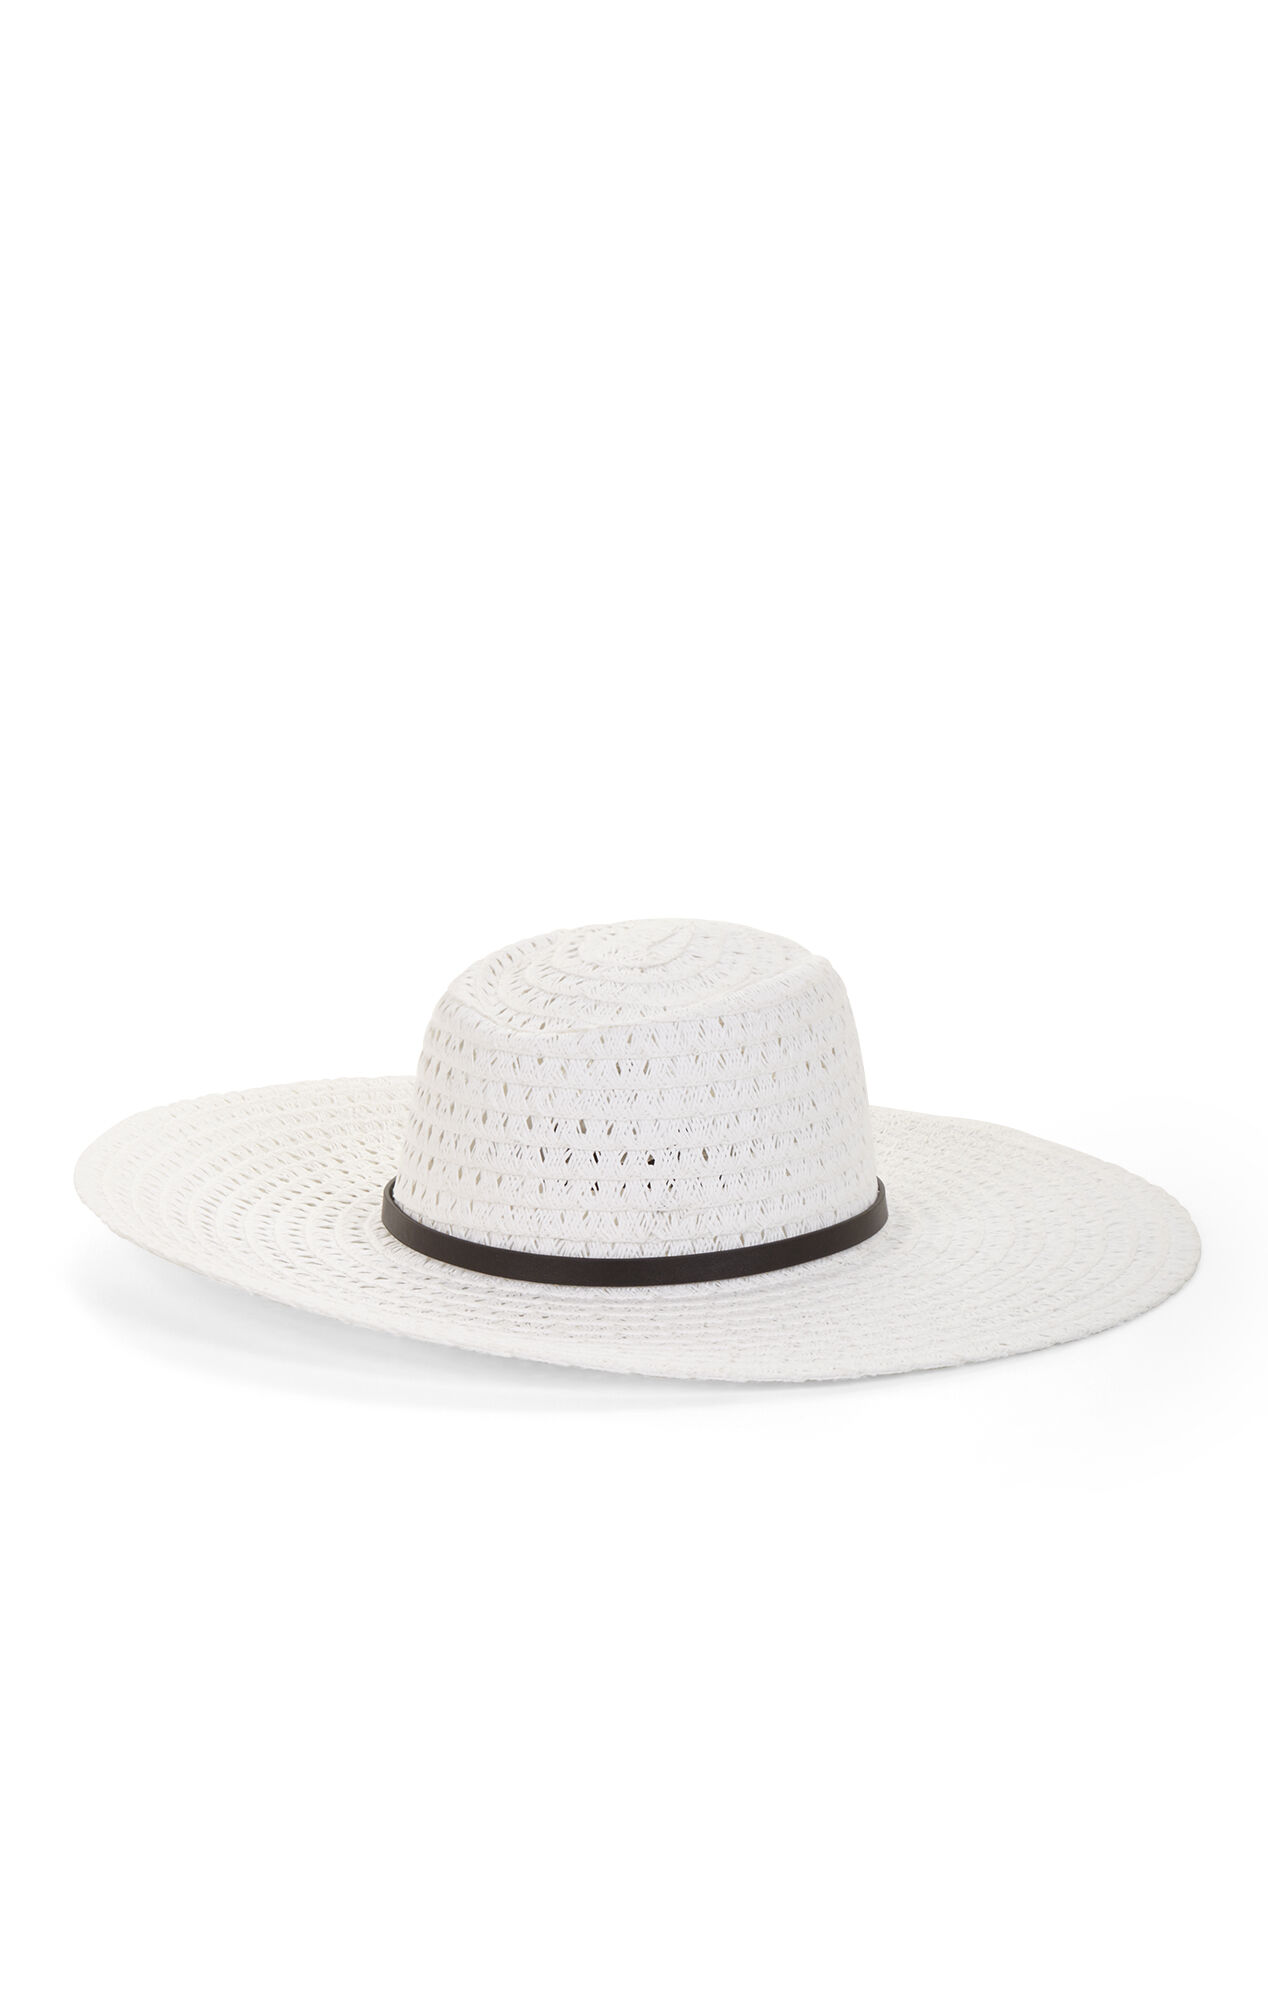 Vintage Woven Panama Hat